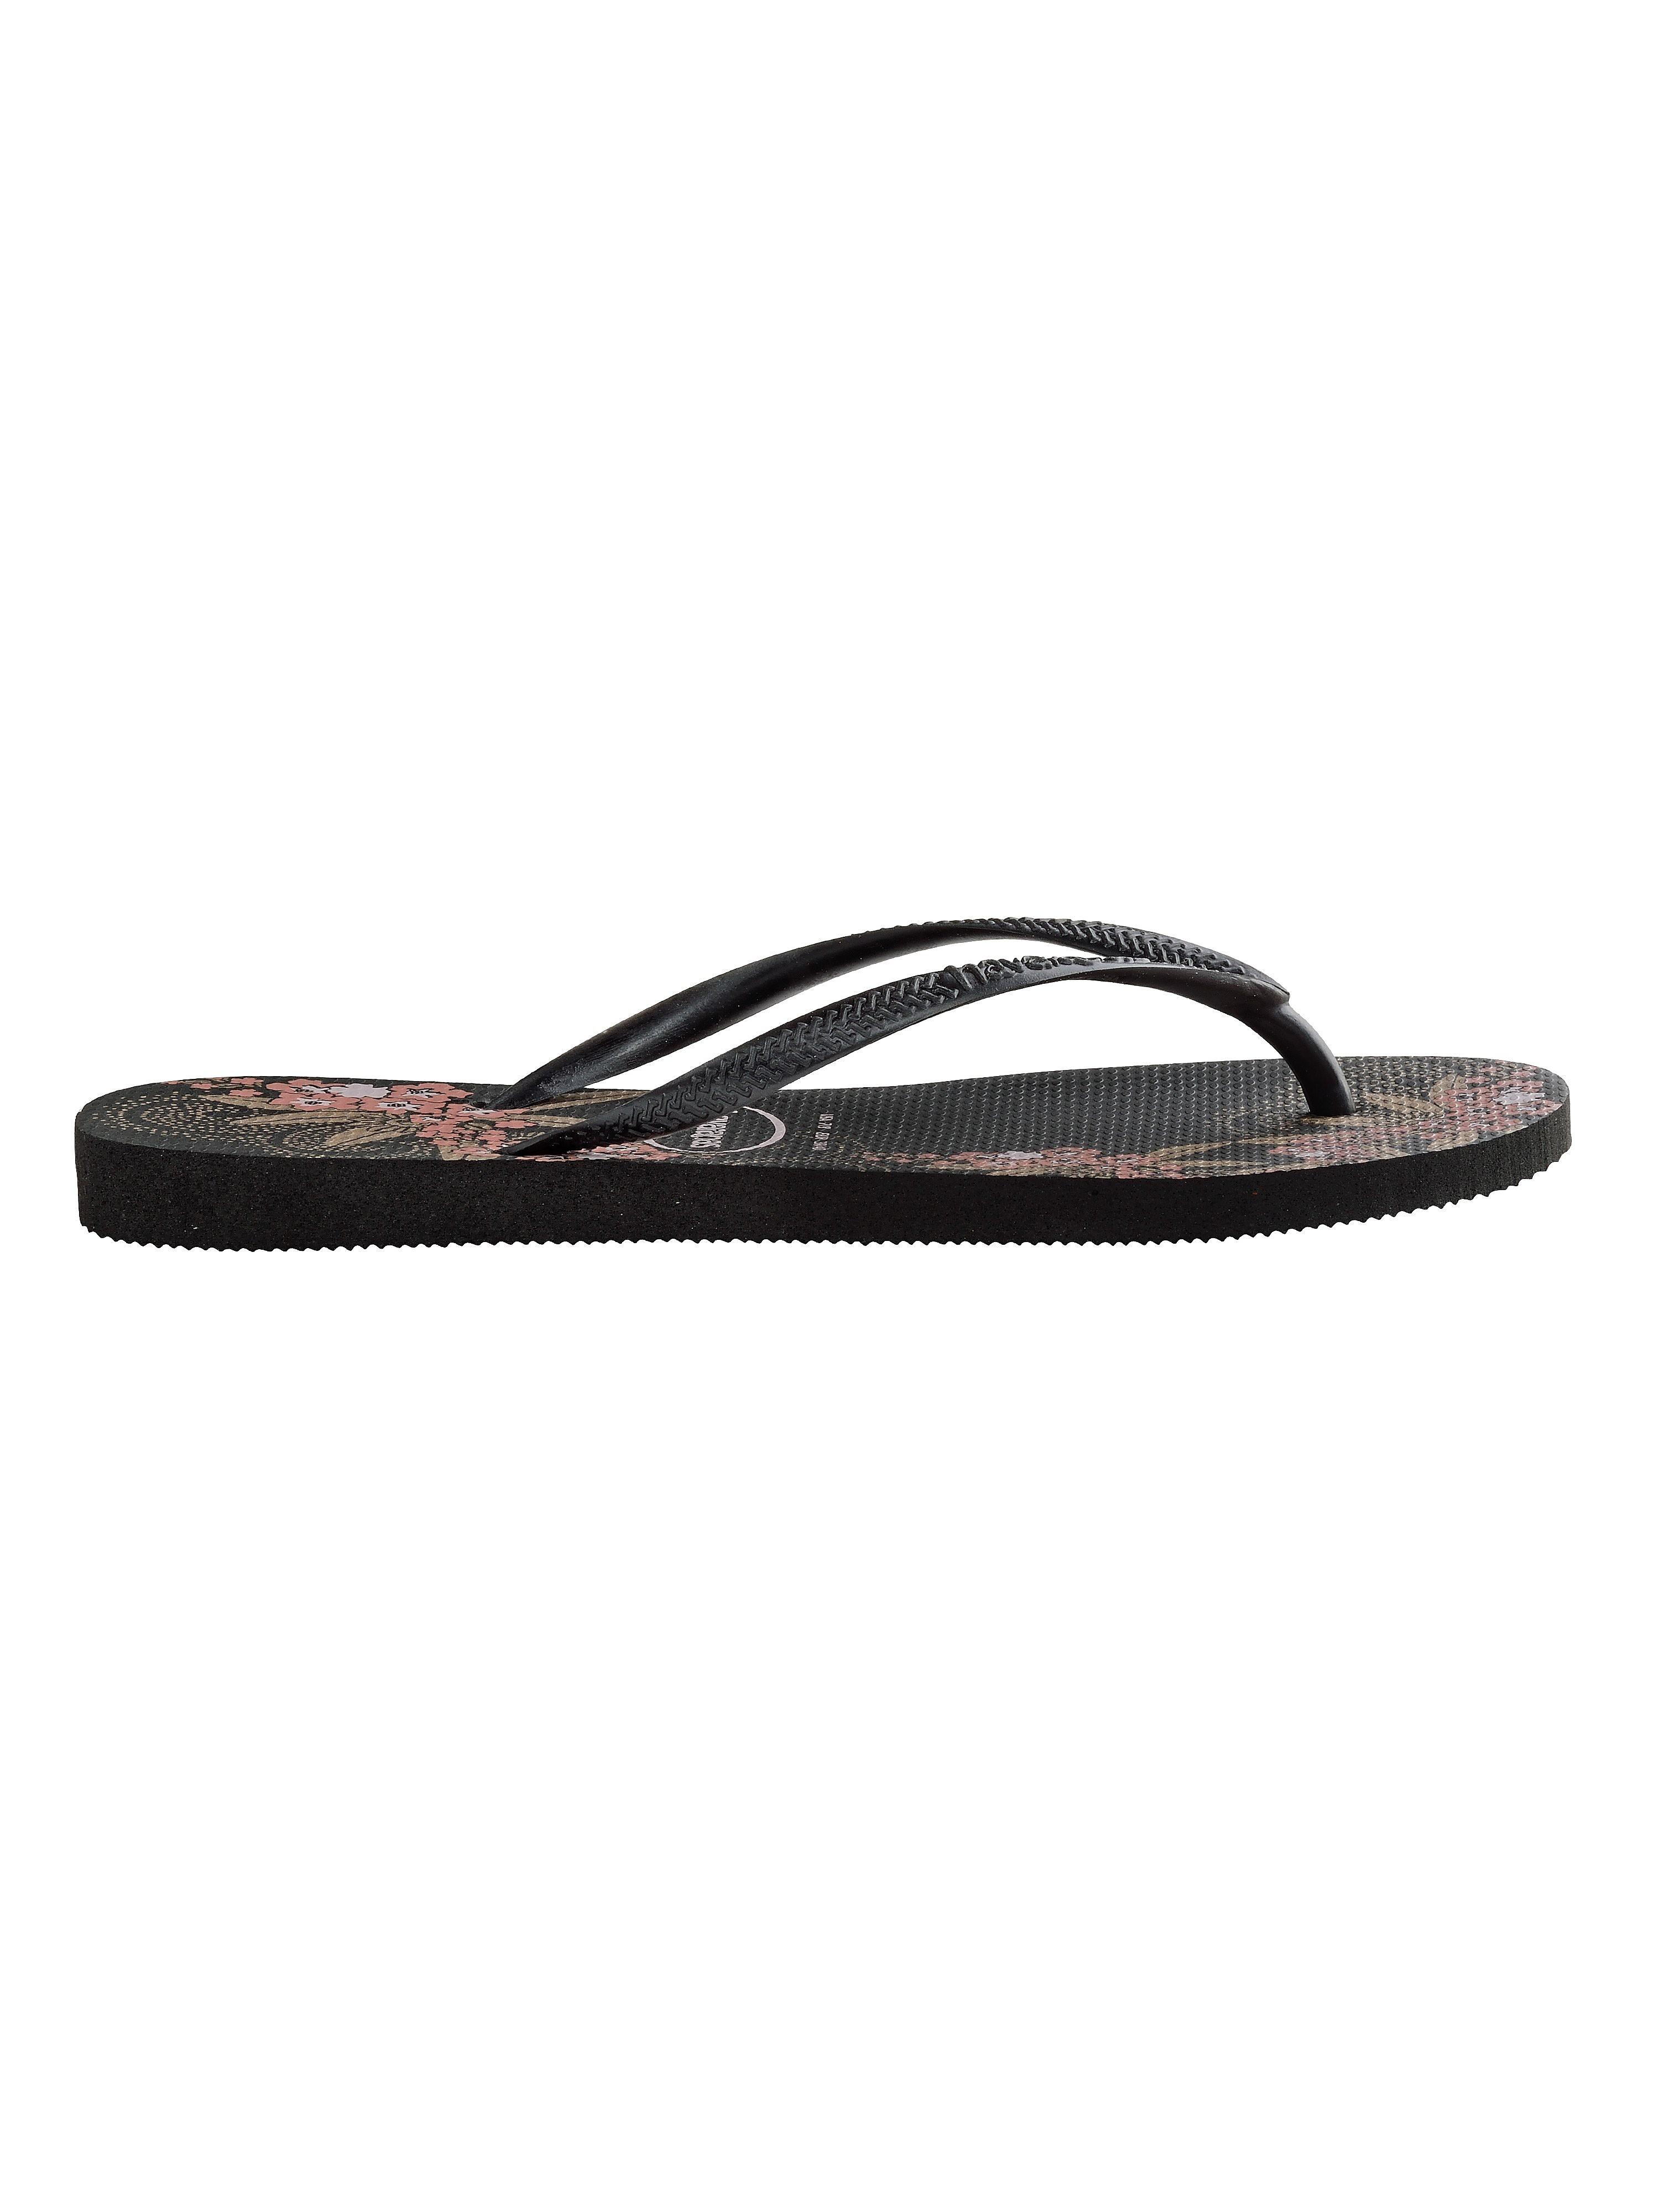 Havaianas Women's Slim Organic Flip Flops - Black